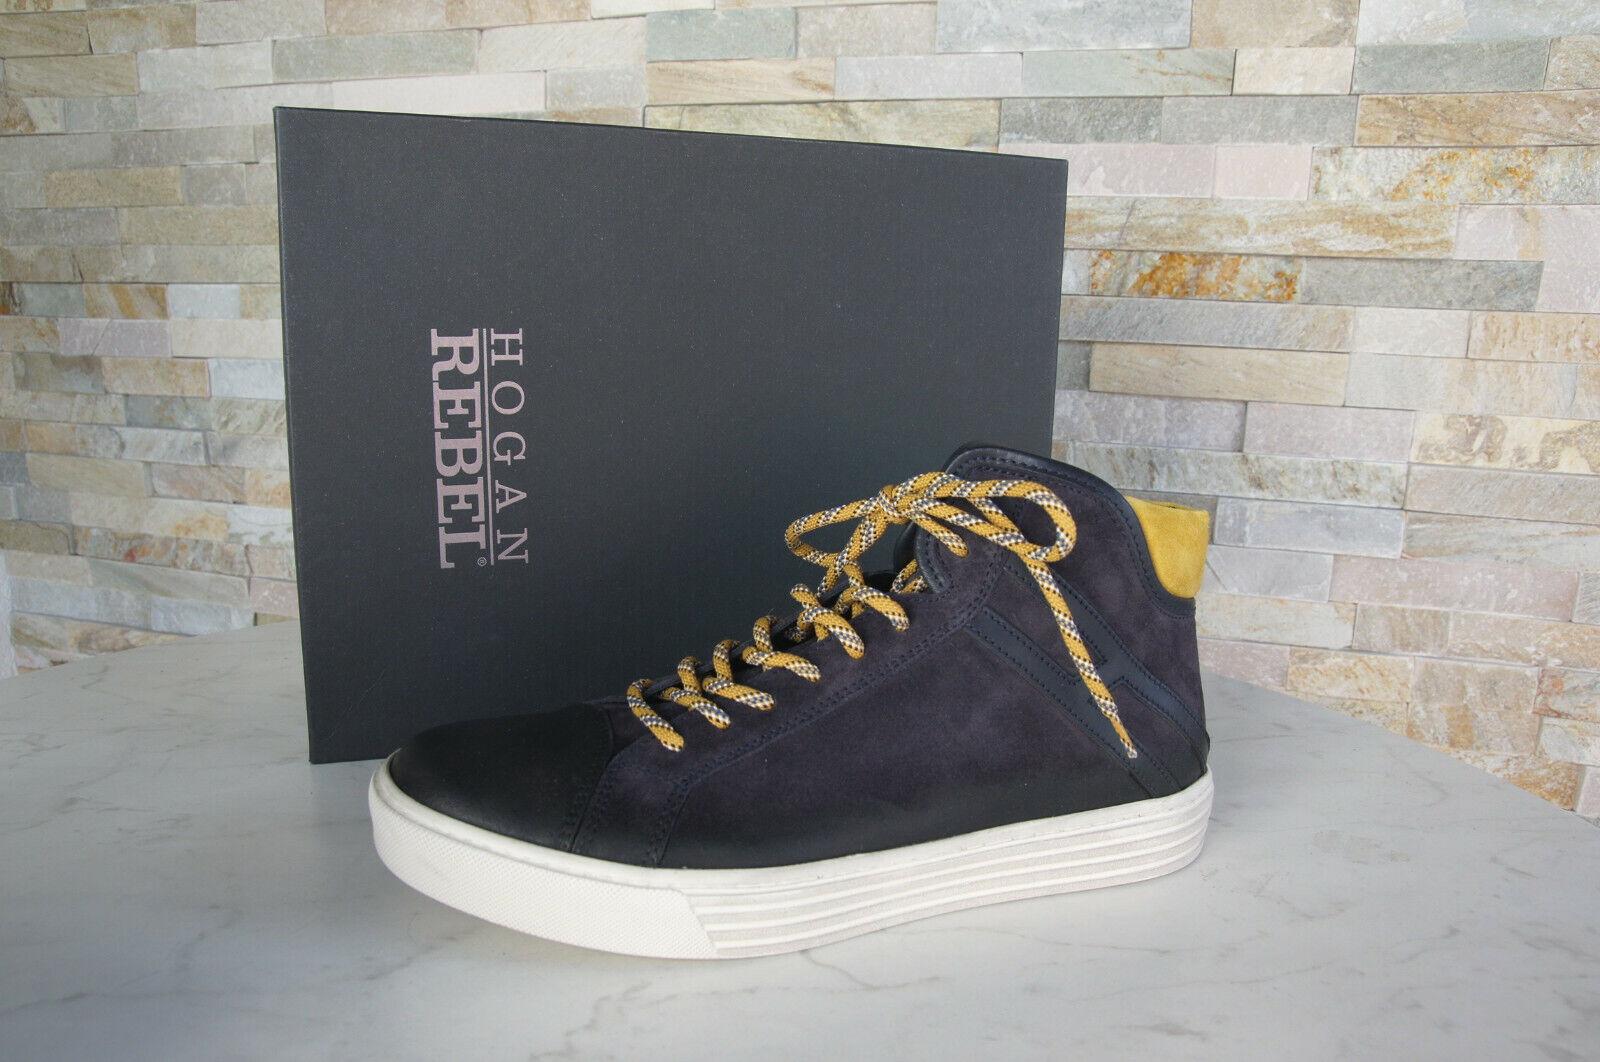 Hogan 6 40 High Top zapatillas Vintage Lace Up zapatos New zapatos azul formerly